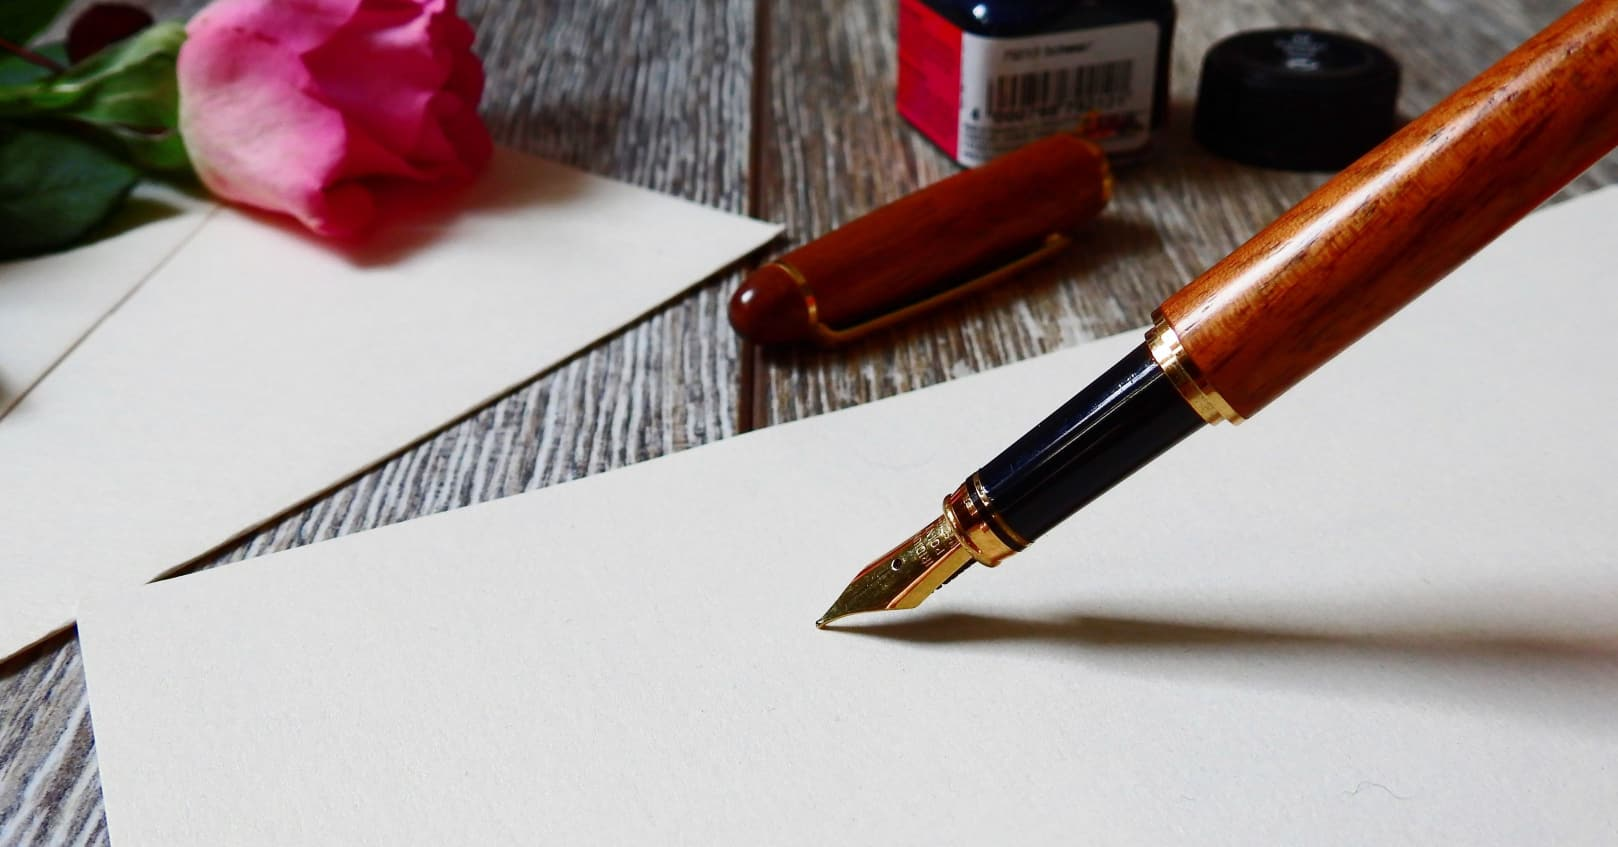 Nunes VS Rushton Copyright Infringement Case, Rushton's Apology